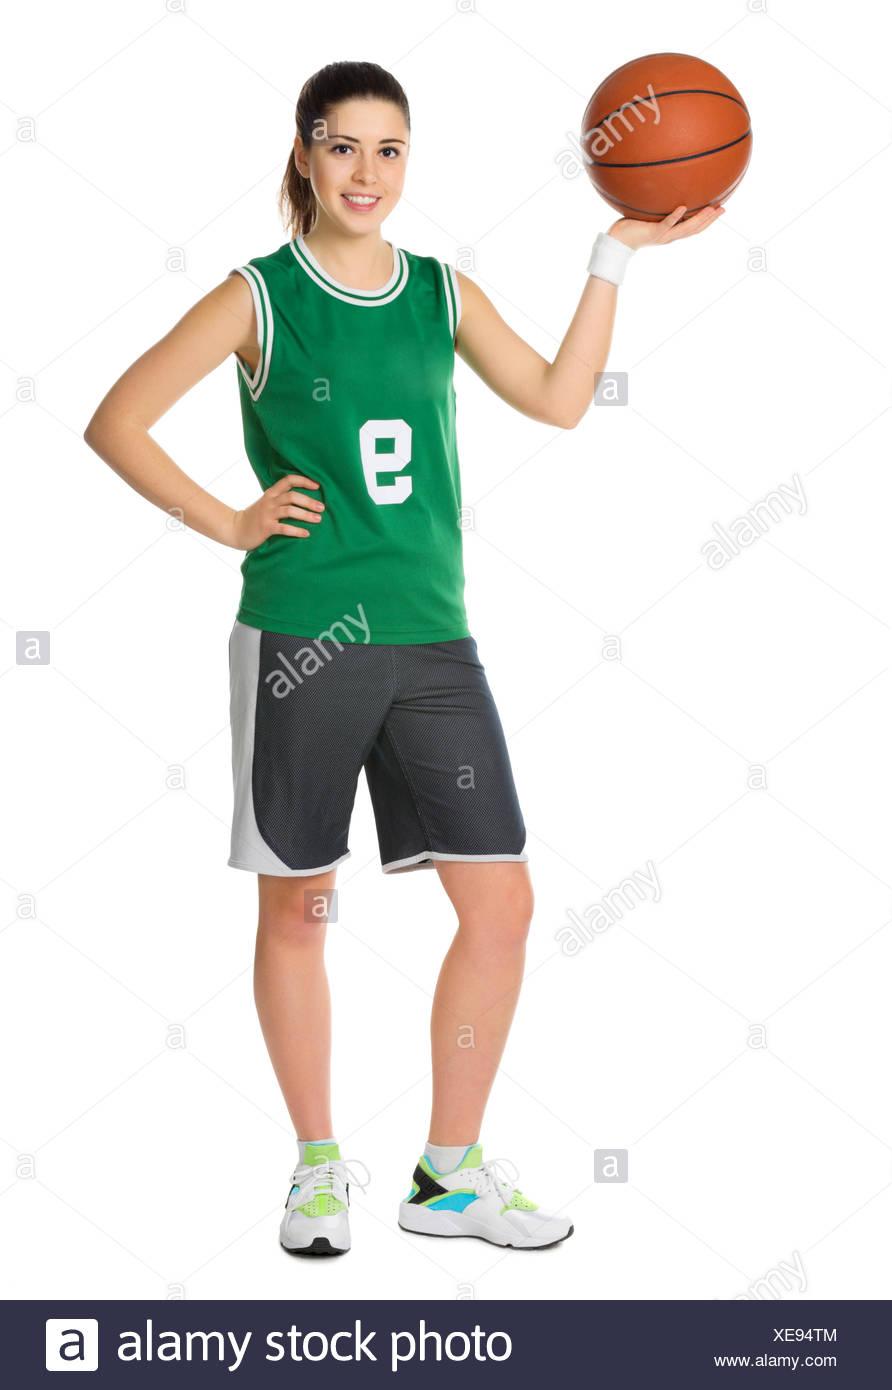 Berühmt Basketball Spieler Lebenslauf Schablone Fotos - Entry Level ...